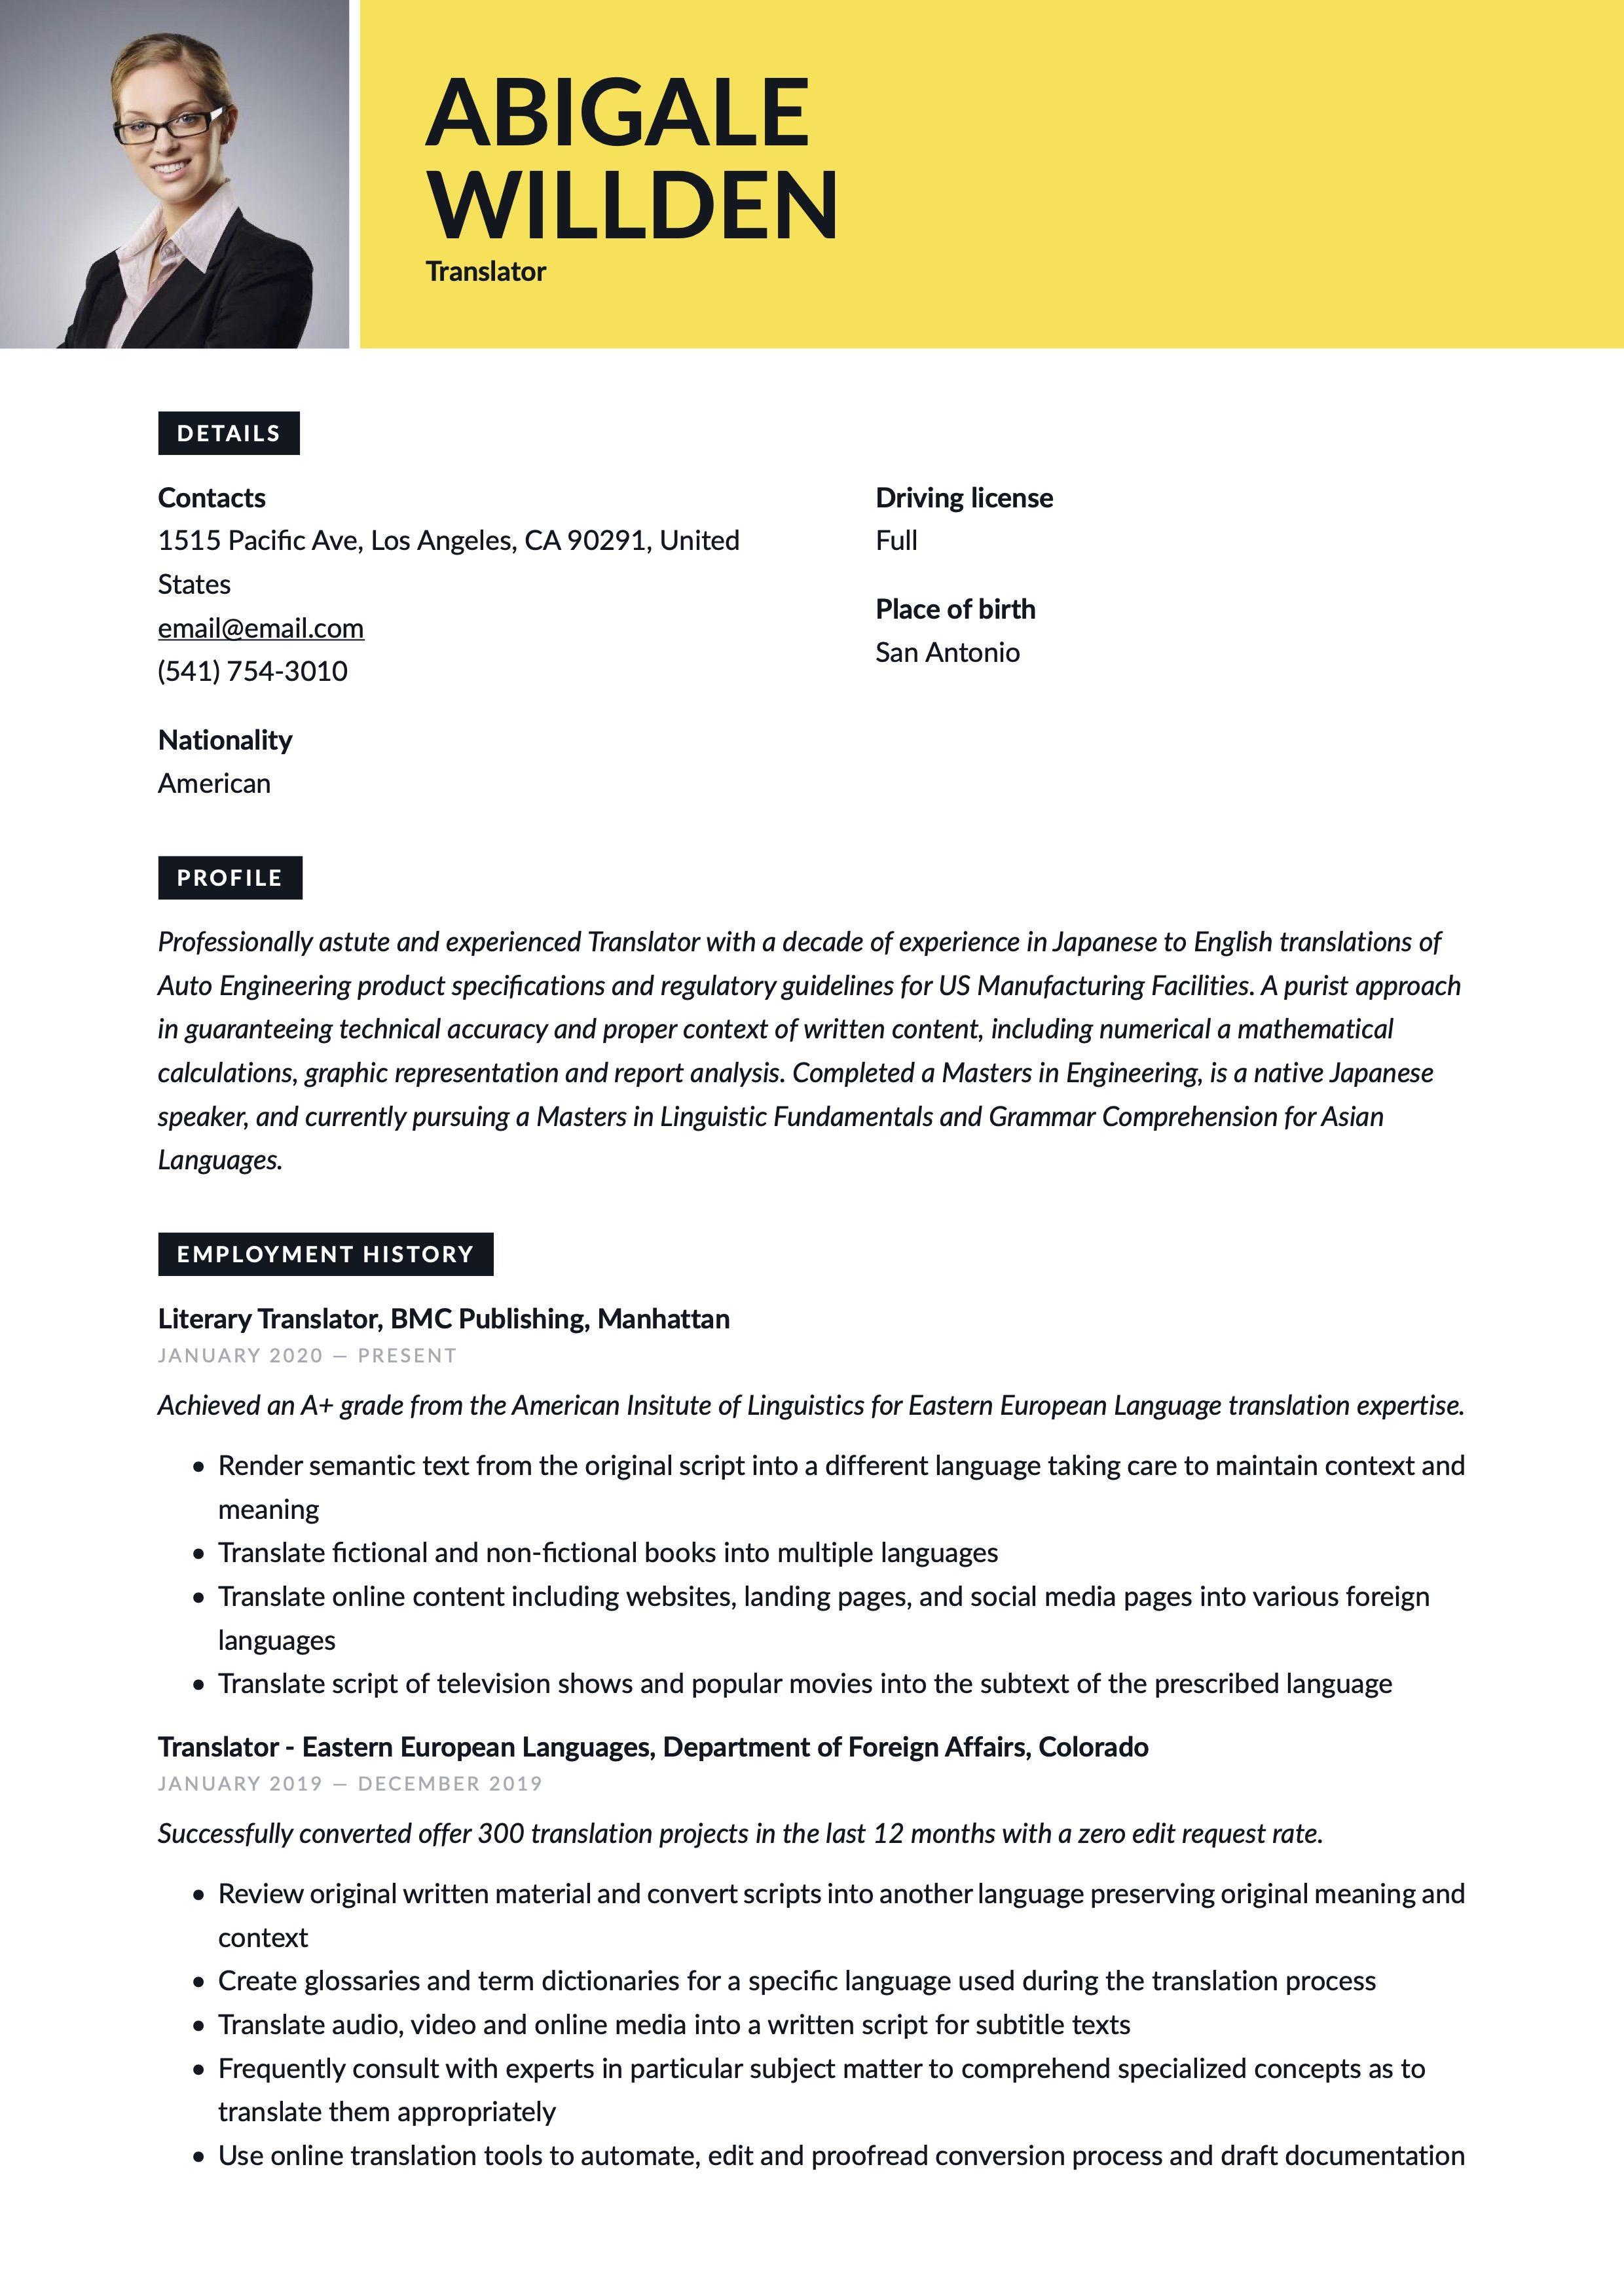 Traslator Resume Template Guided Writing Resume Writing Resume